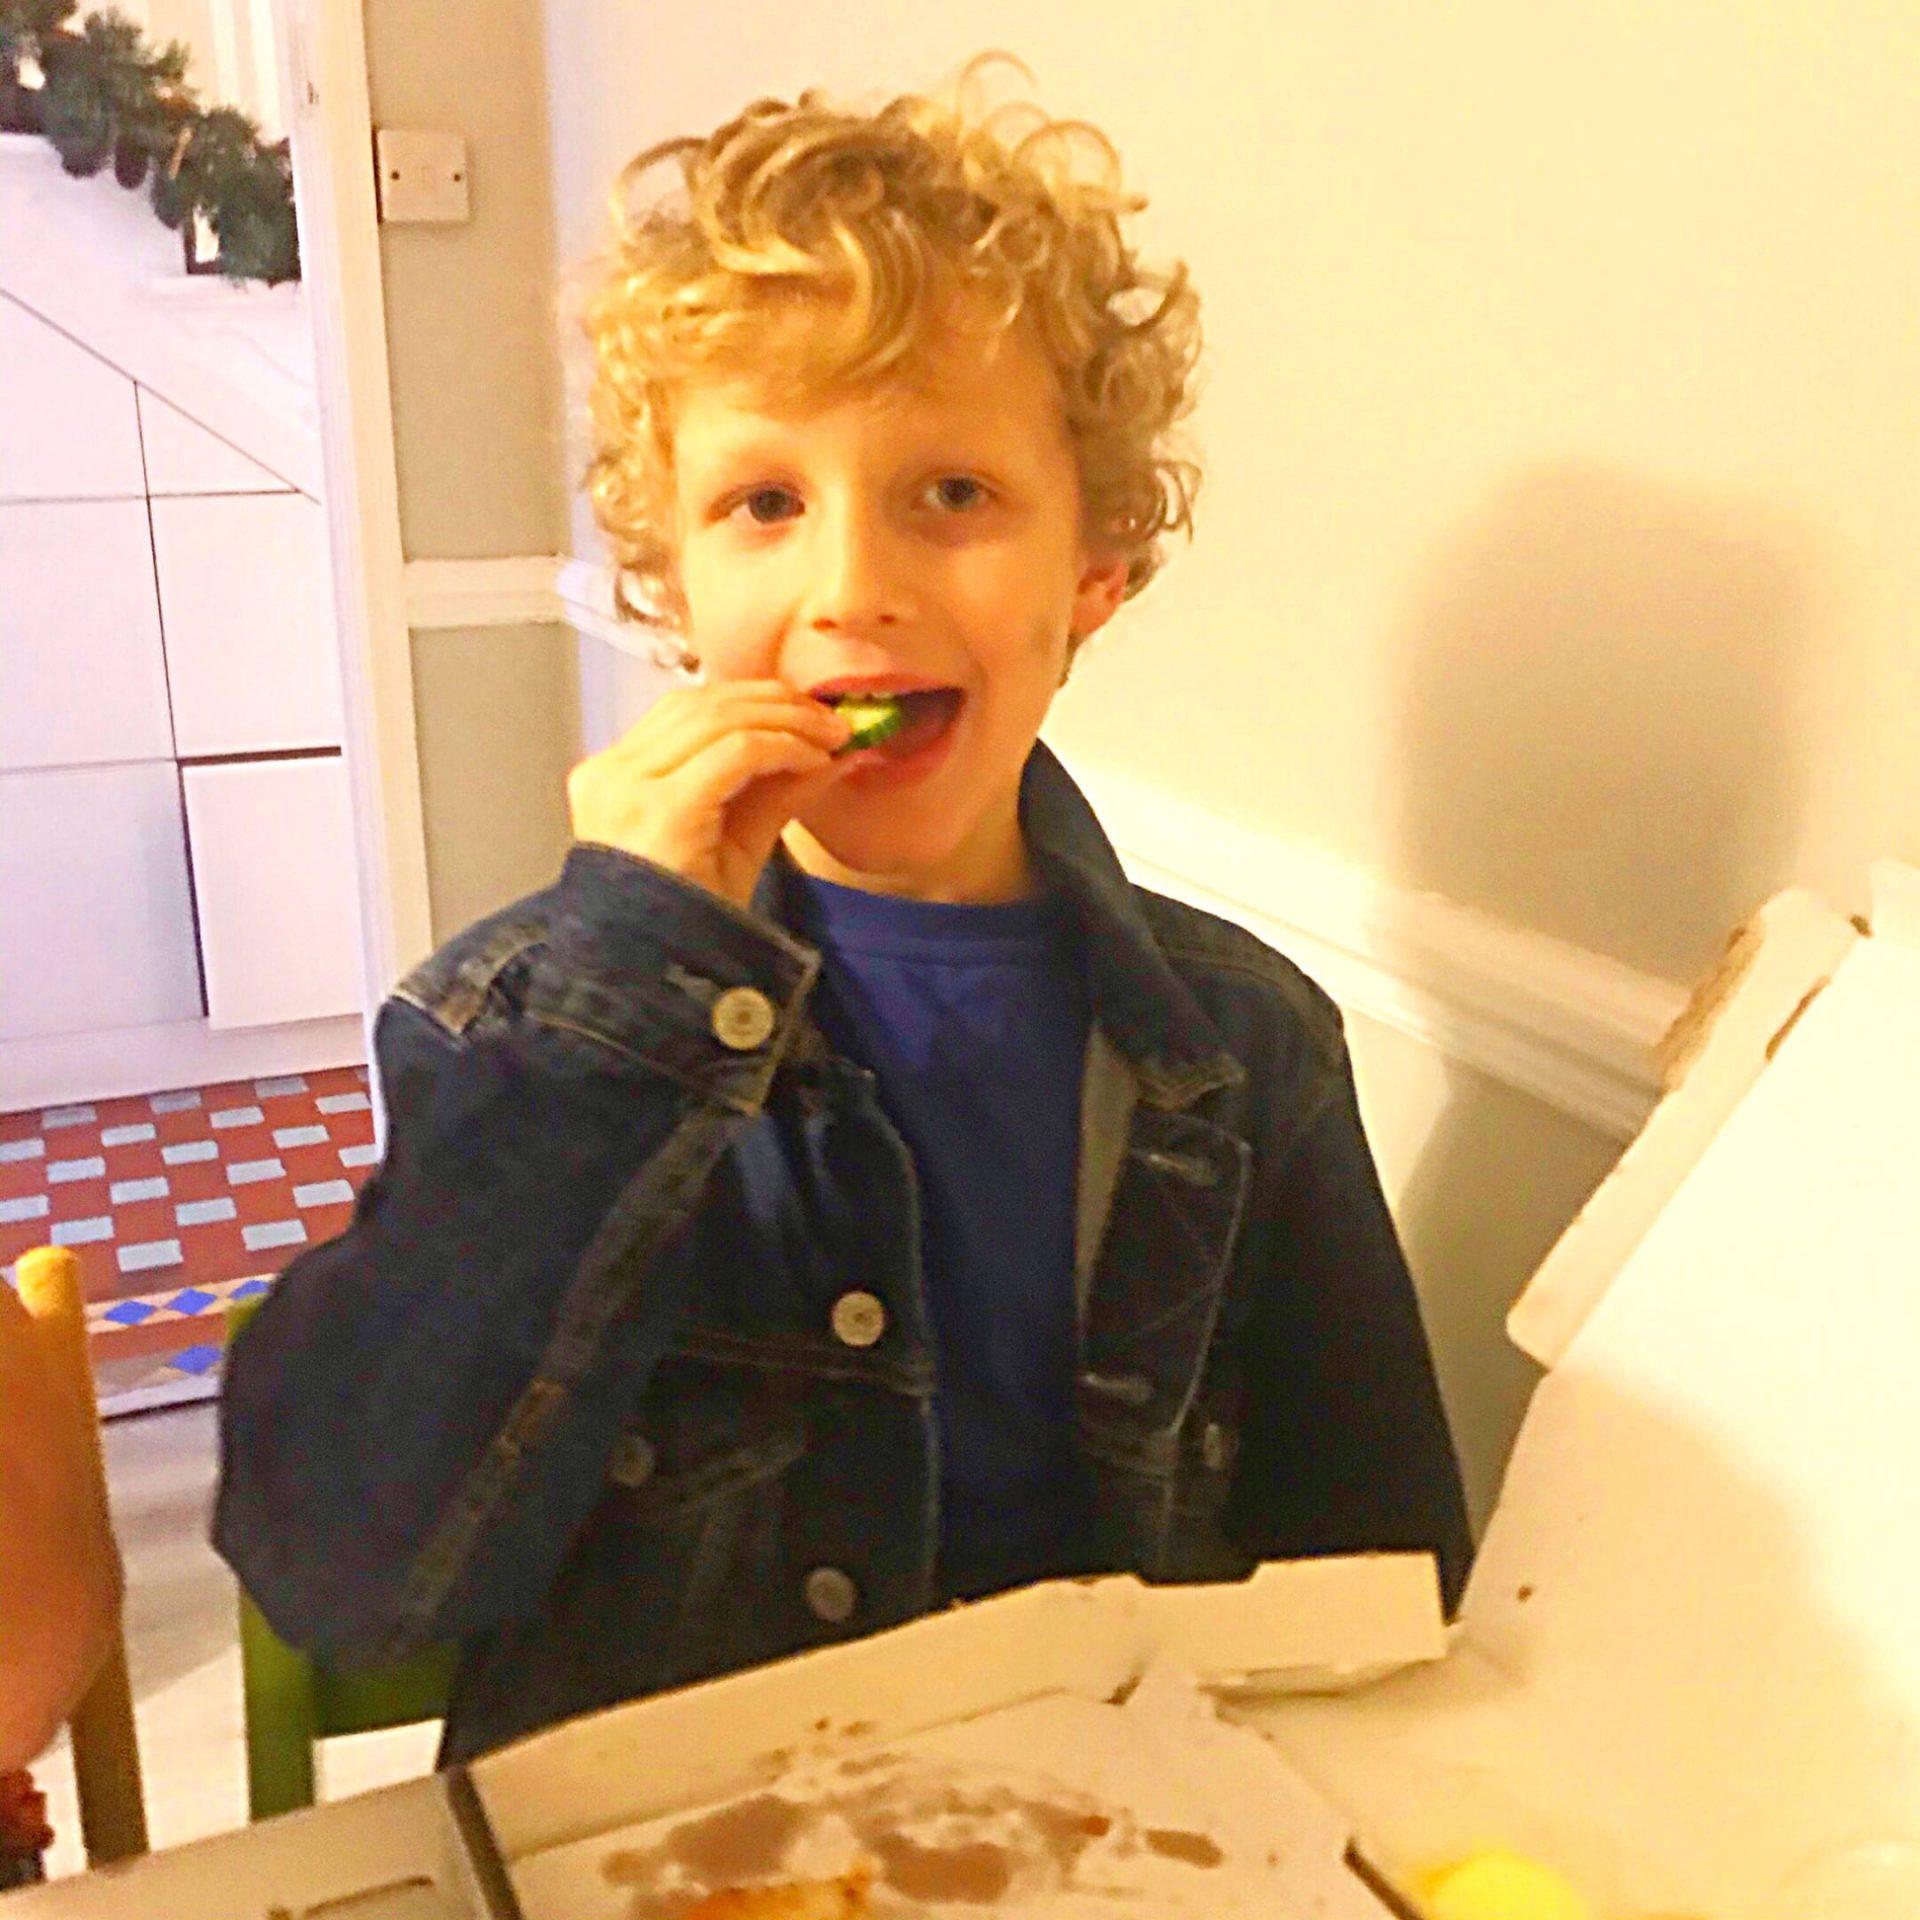 Boy eating cucumber on family night